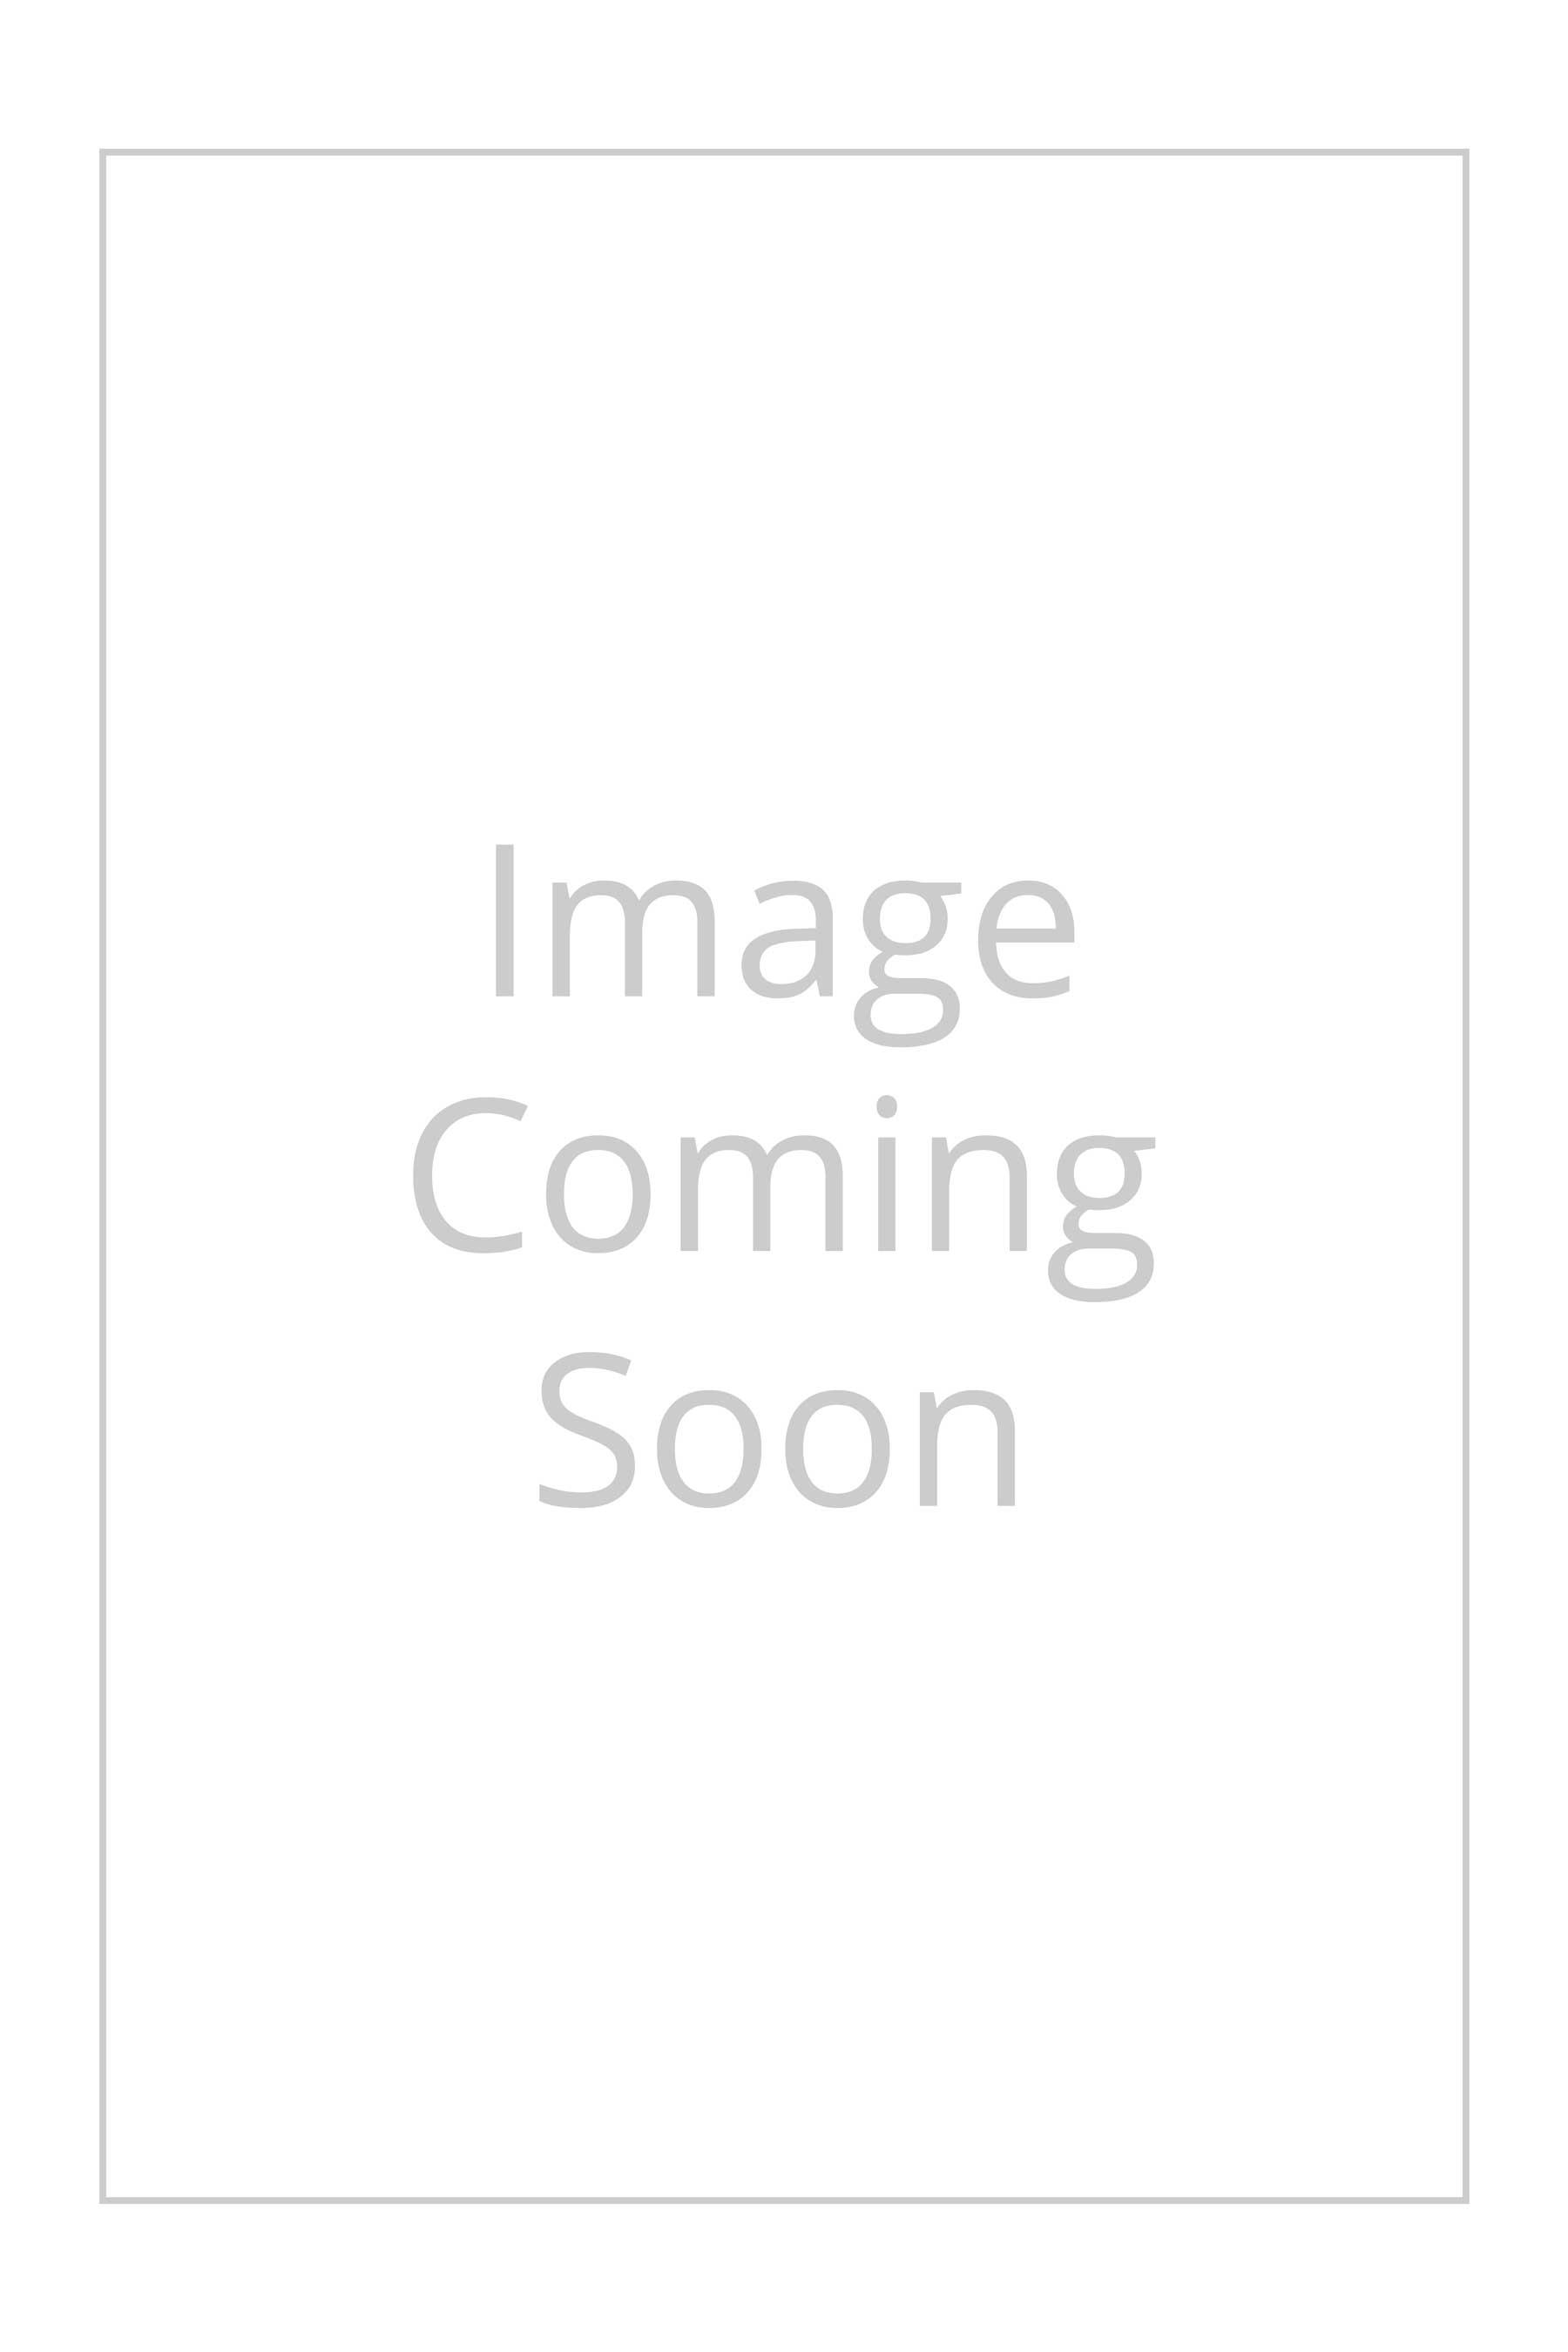 Burberry Black & White Plaid Wool / Cashmere Blend Scarf